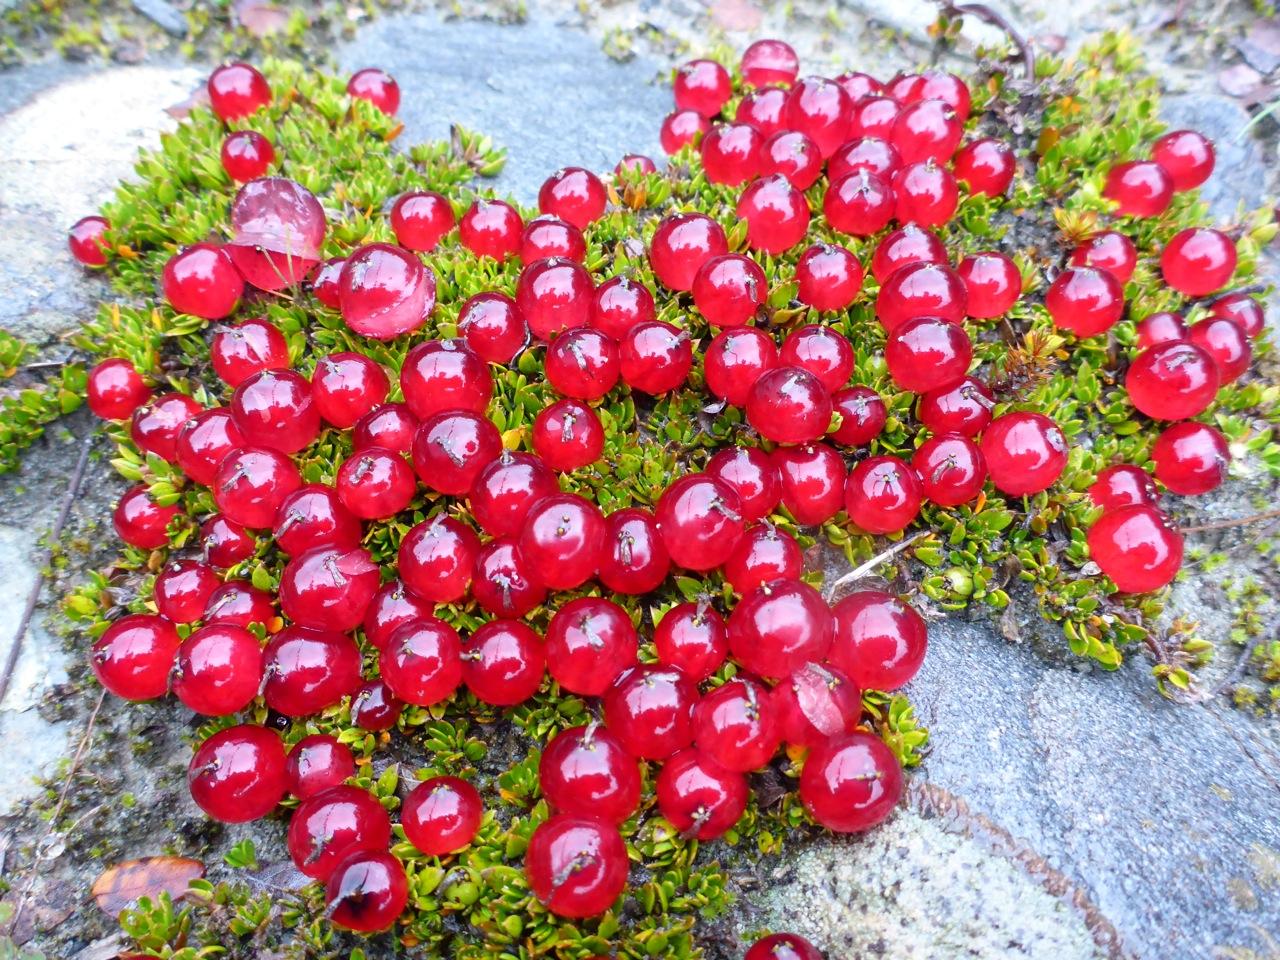 Berries on the ground.. Breandan??